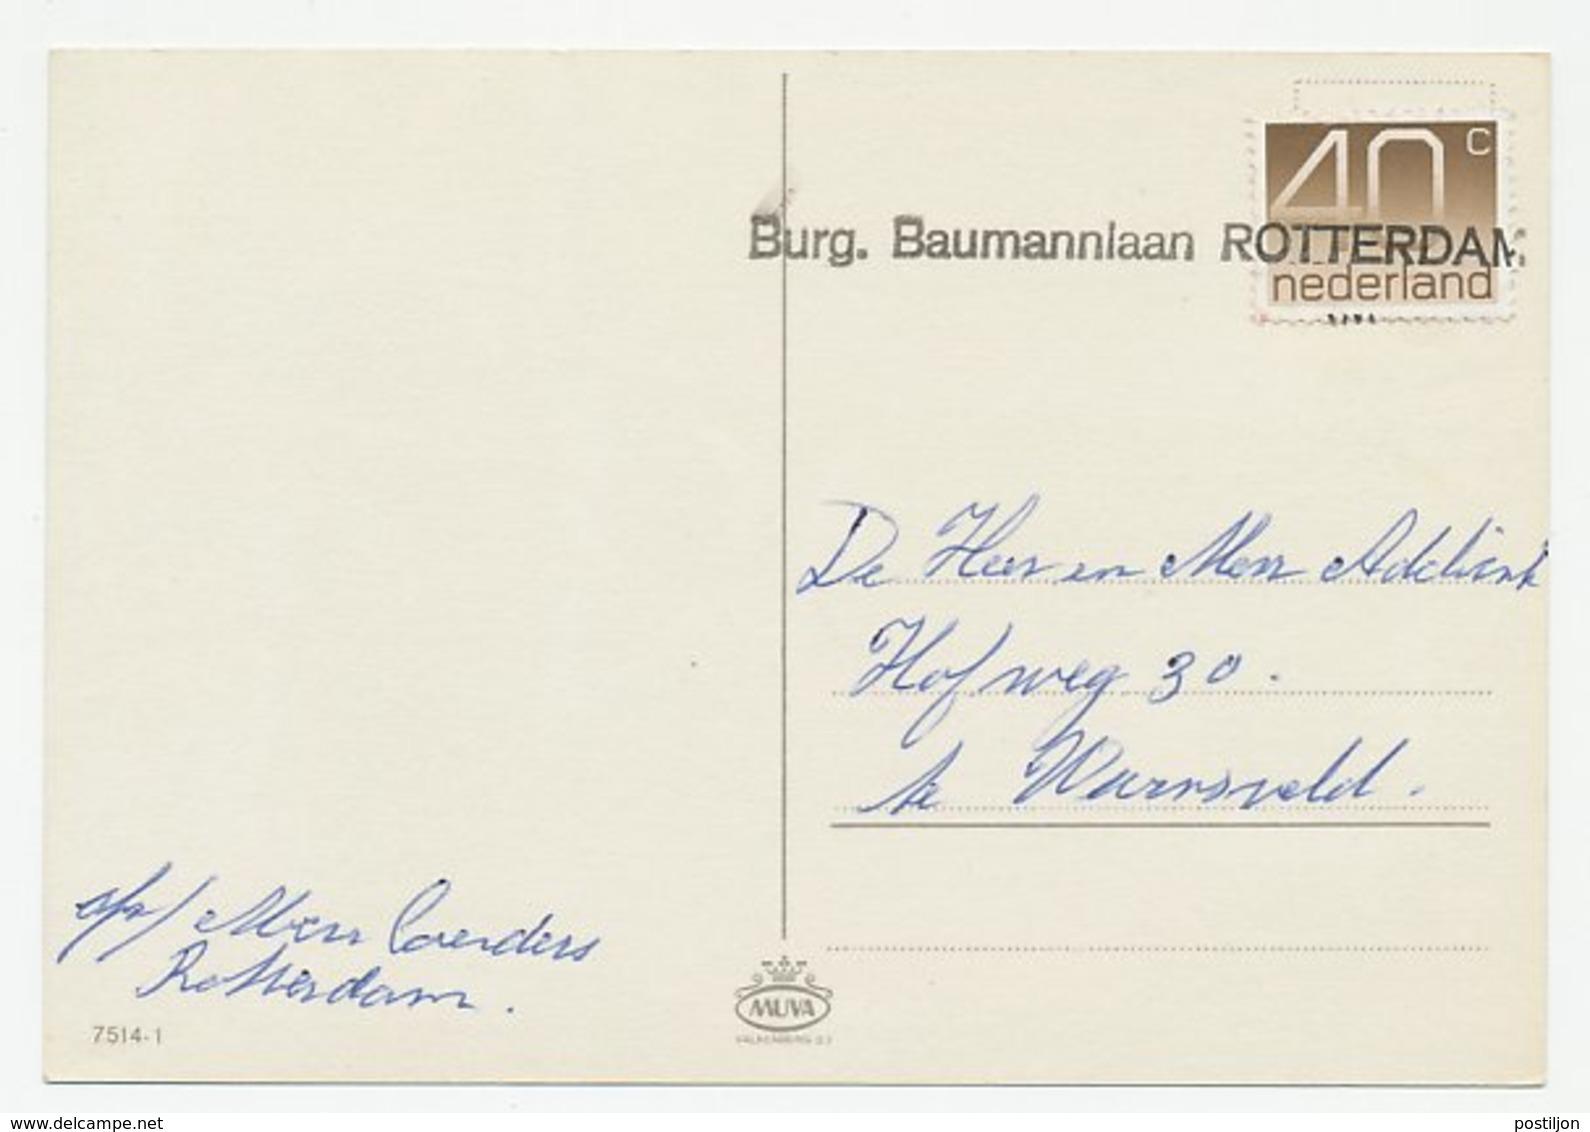 Nieuwjaarshandstempel : Burg. Baumannlaan Rotterdam - Period 1949-1980 (Juliana)